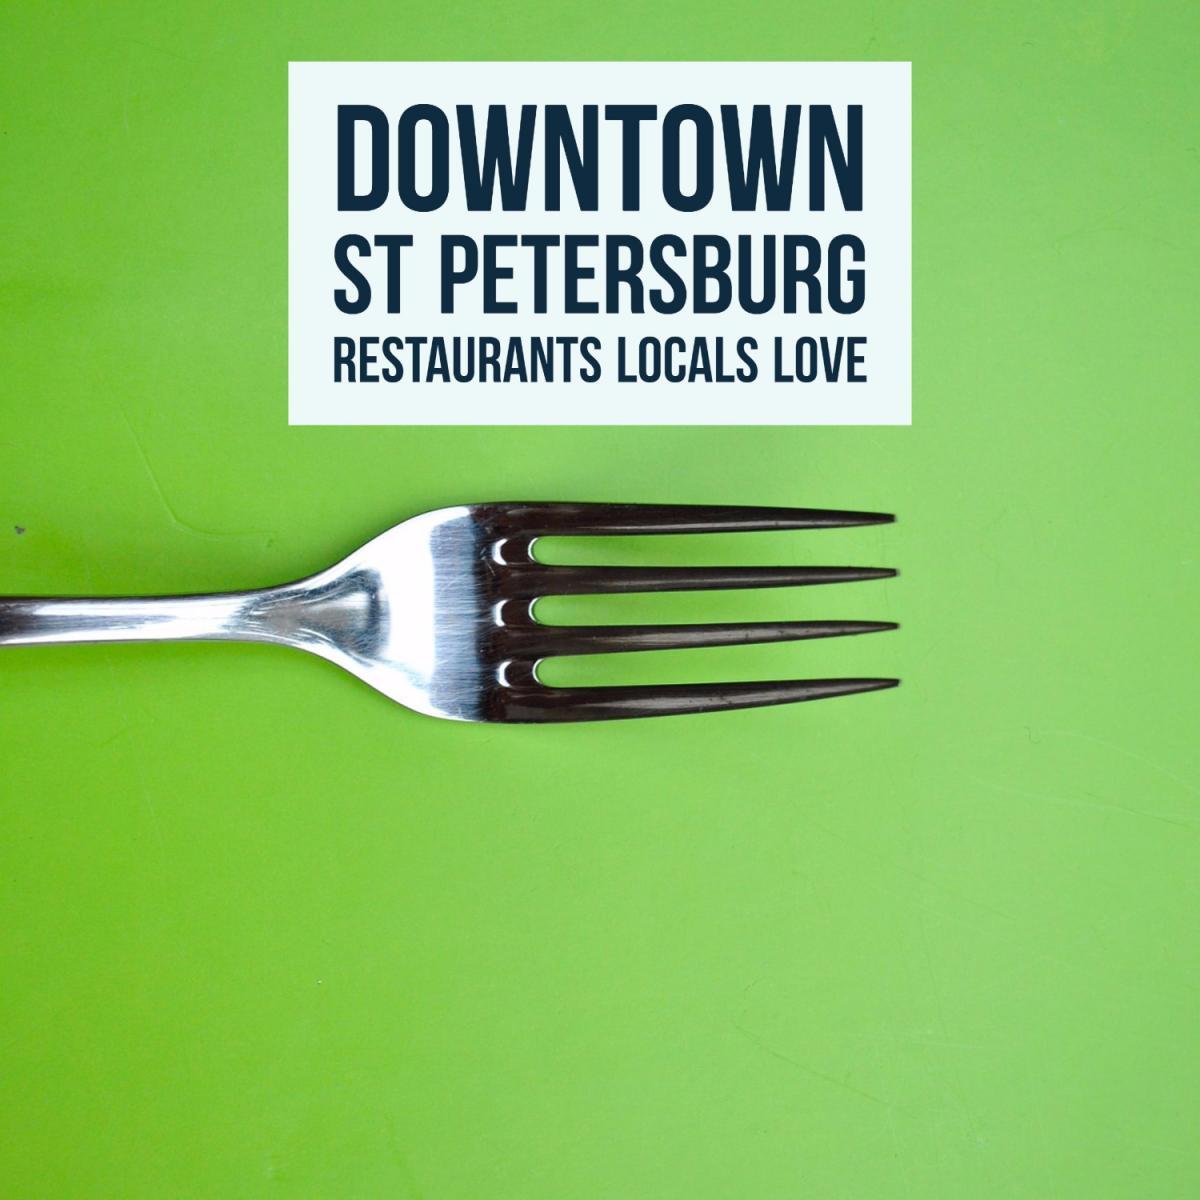 Downtown St Petersburg Restaurants